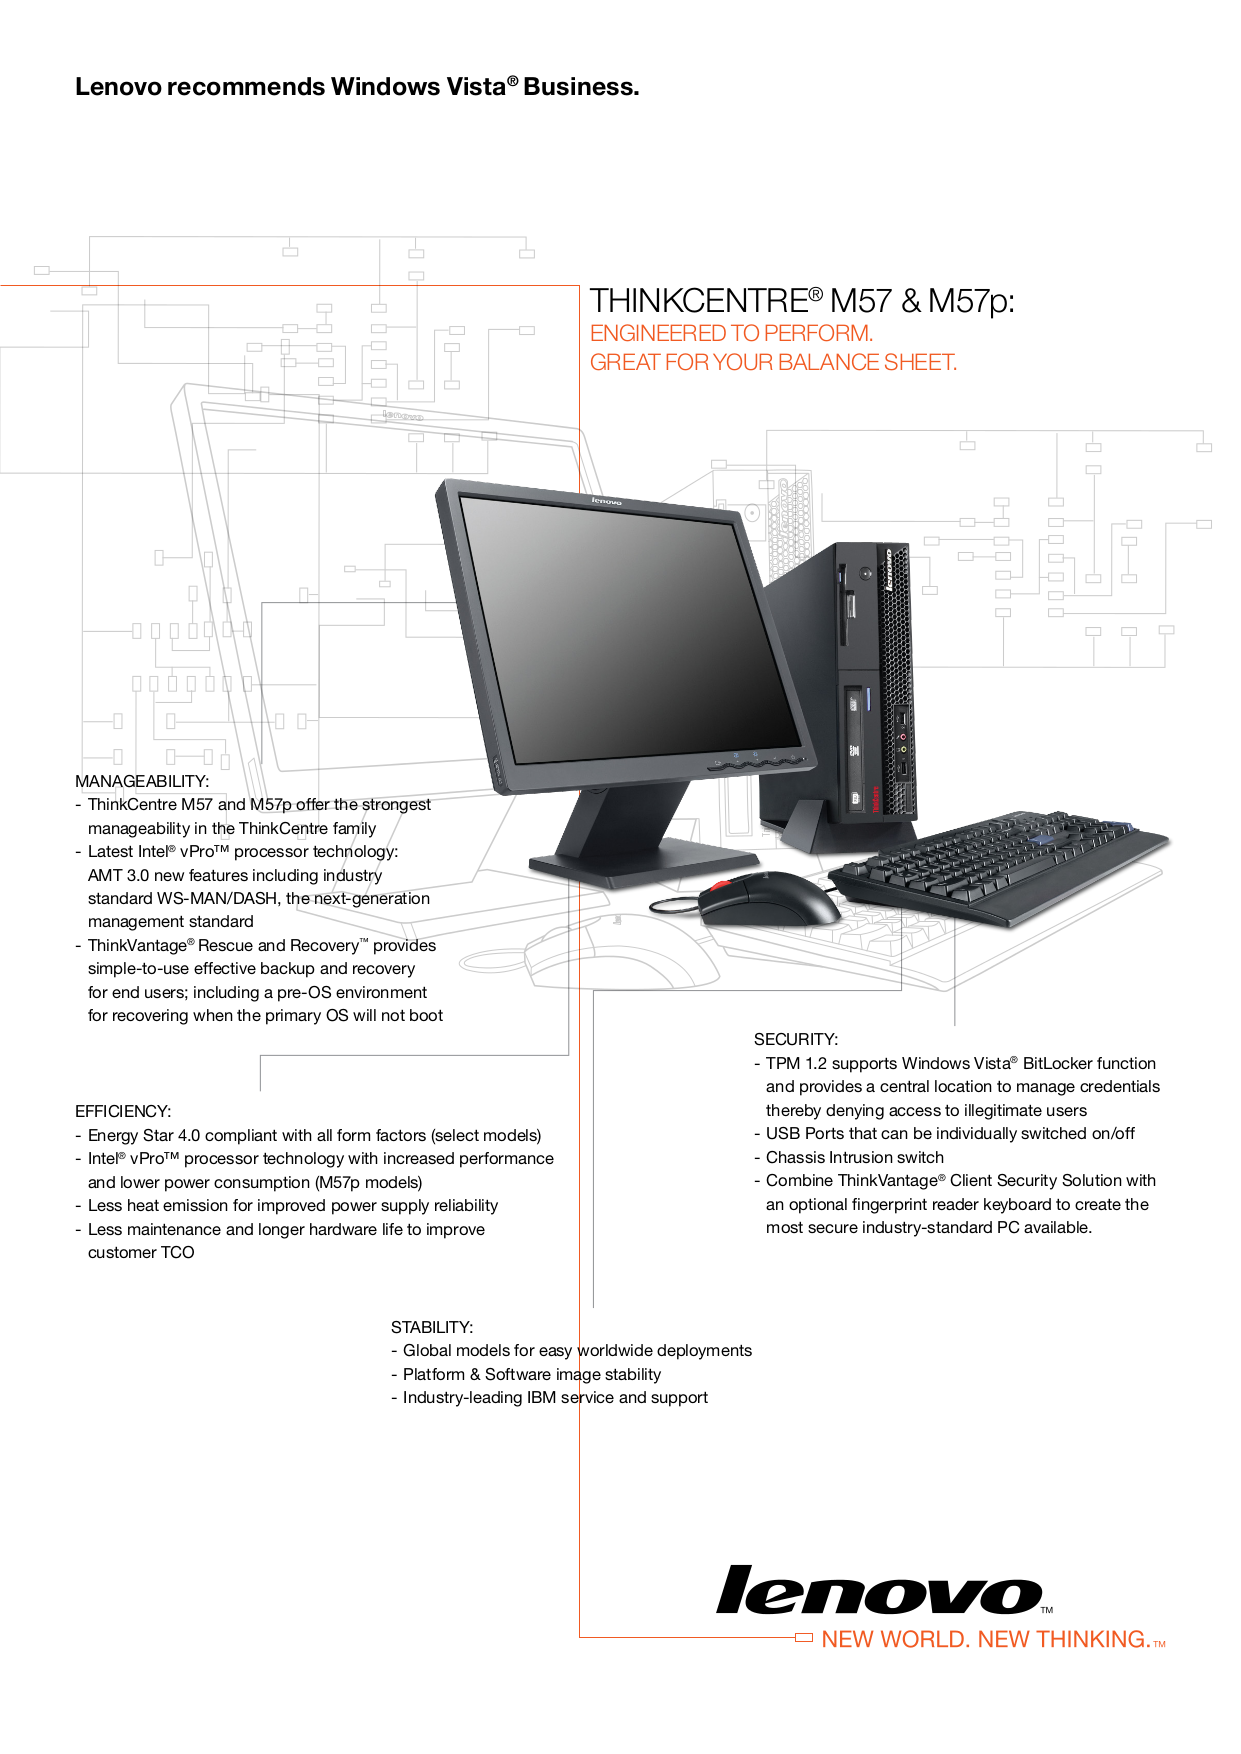 pdf for Lenovo Desktop ThinkCentre M57p 6088 manual